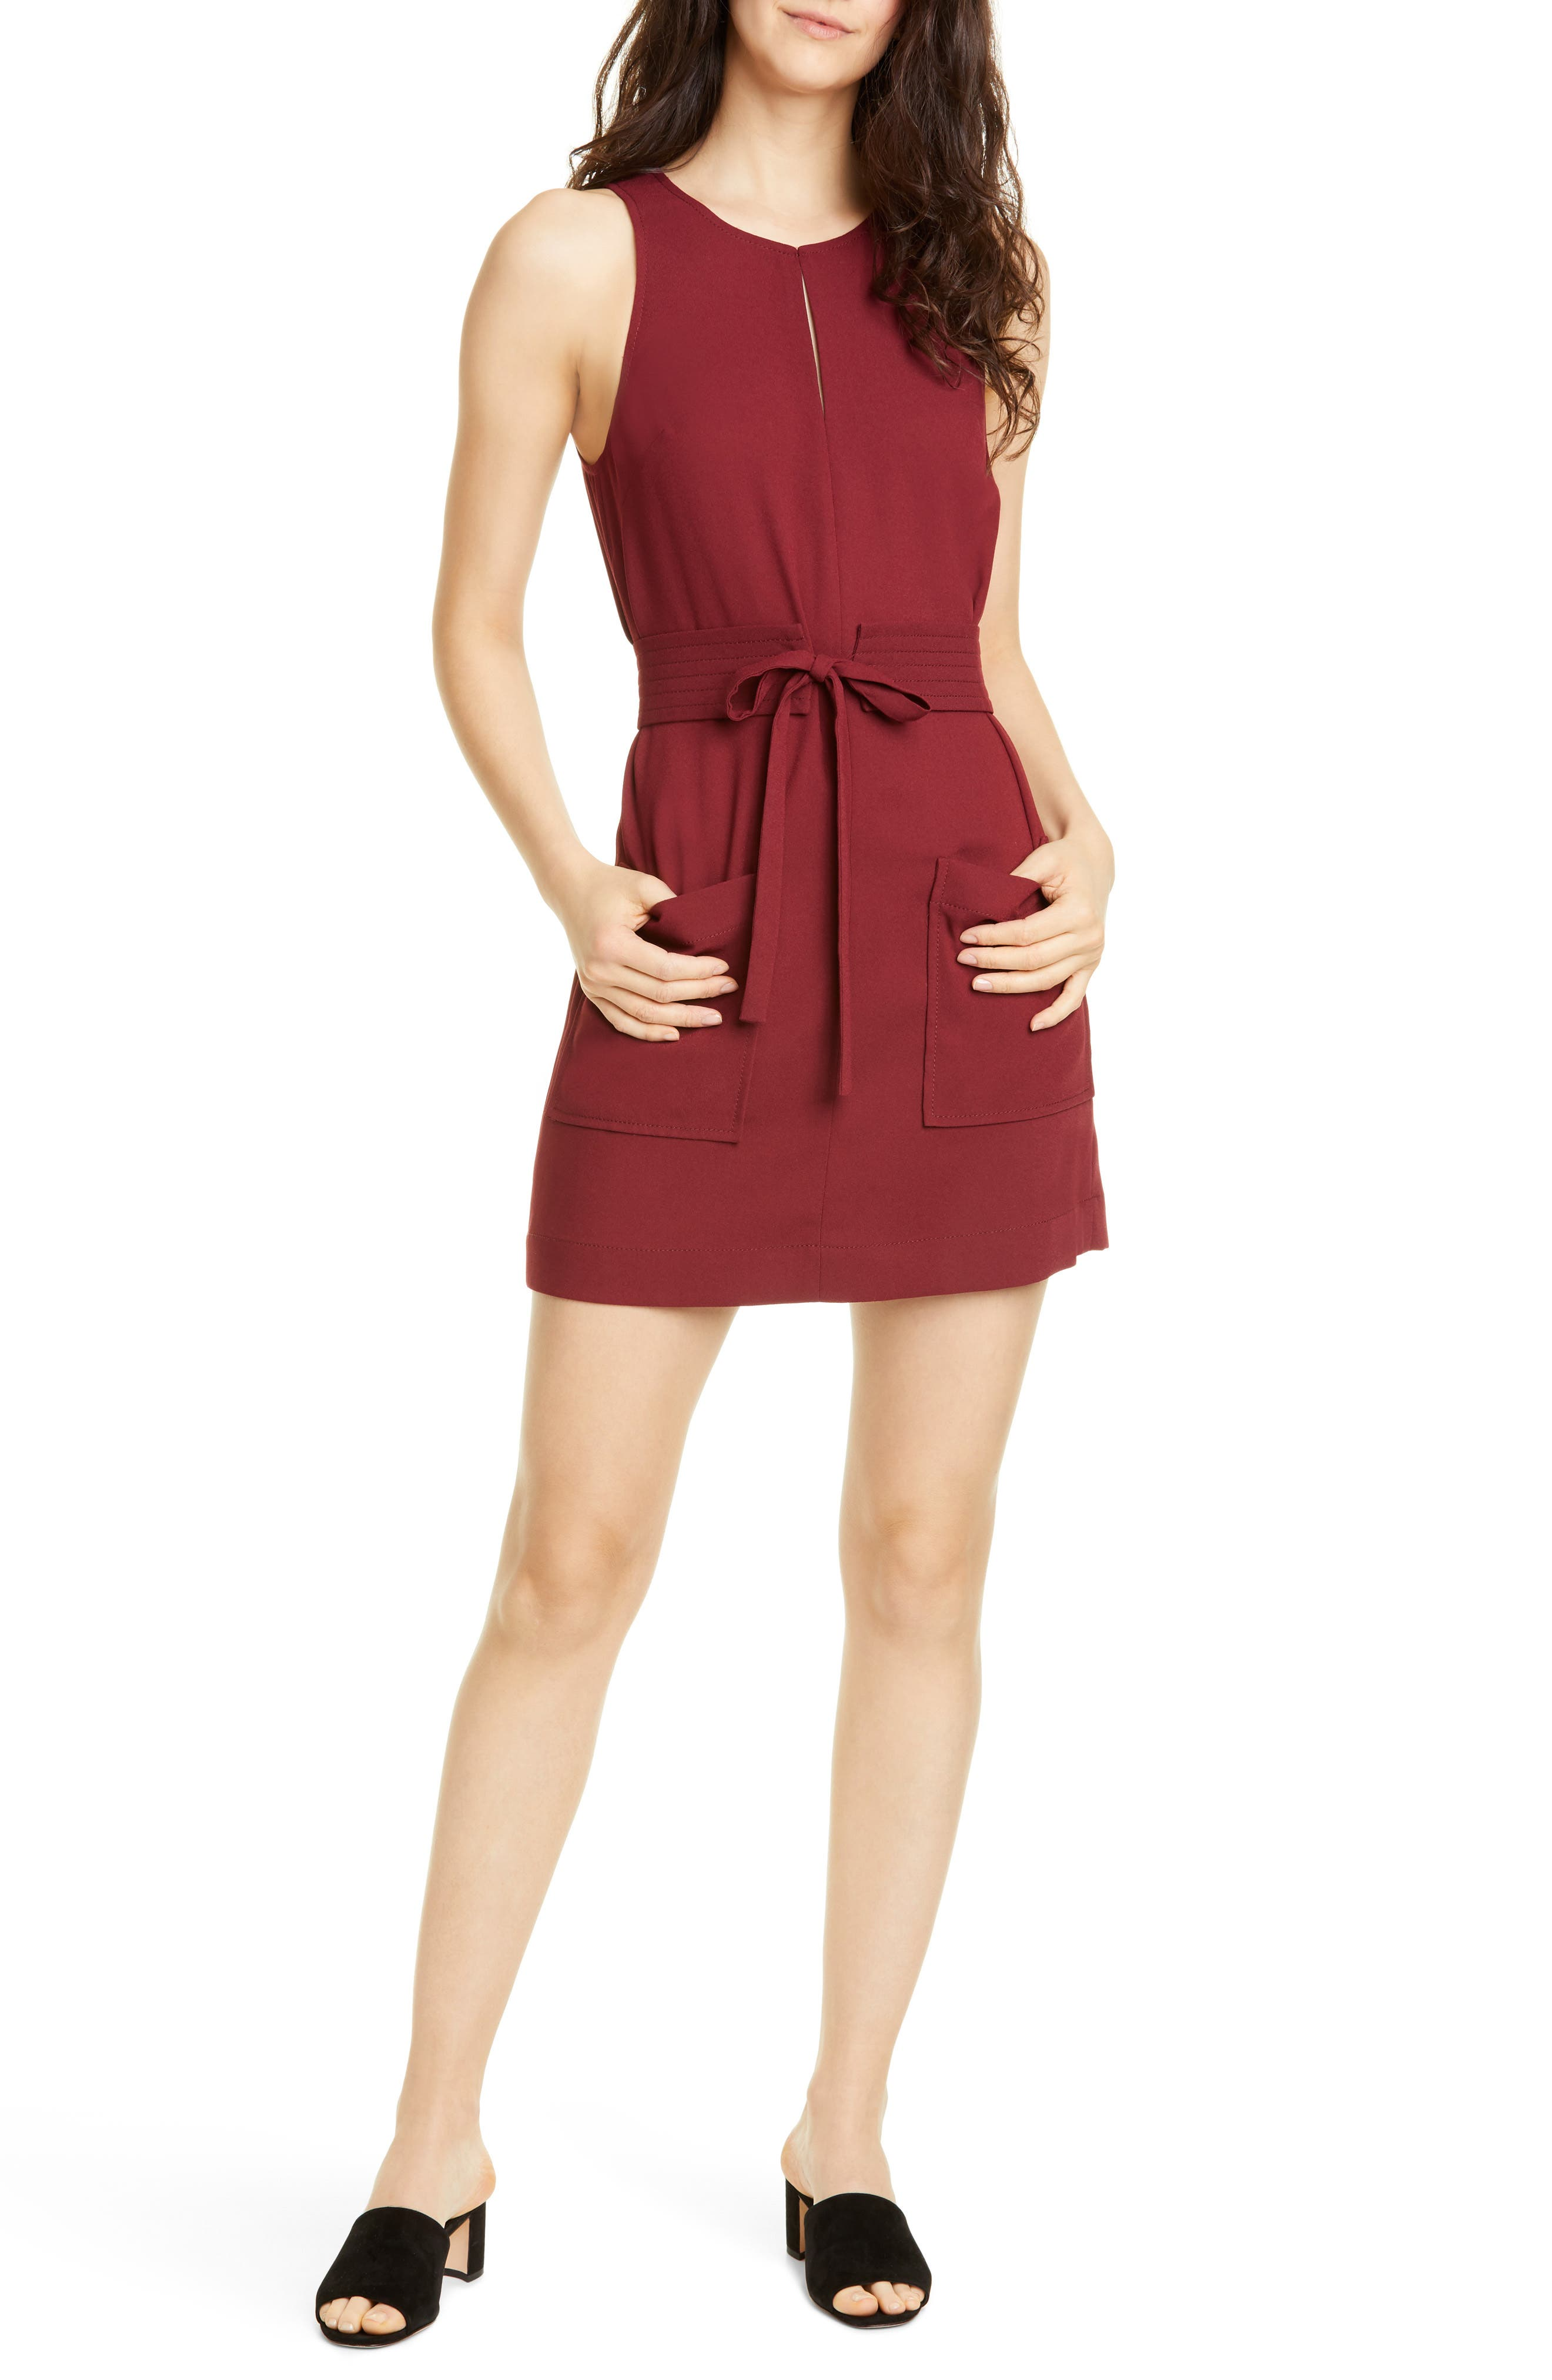 Joie Puck Tie Belt Sleeveless Minidress, Burgundy